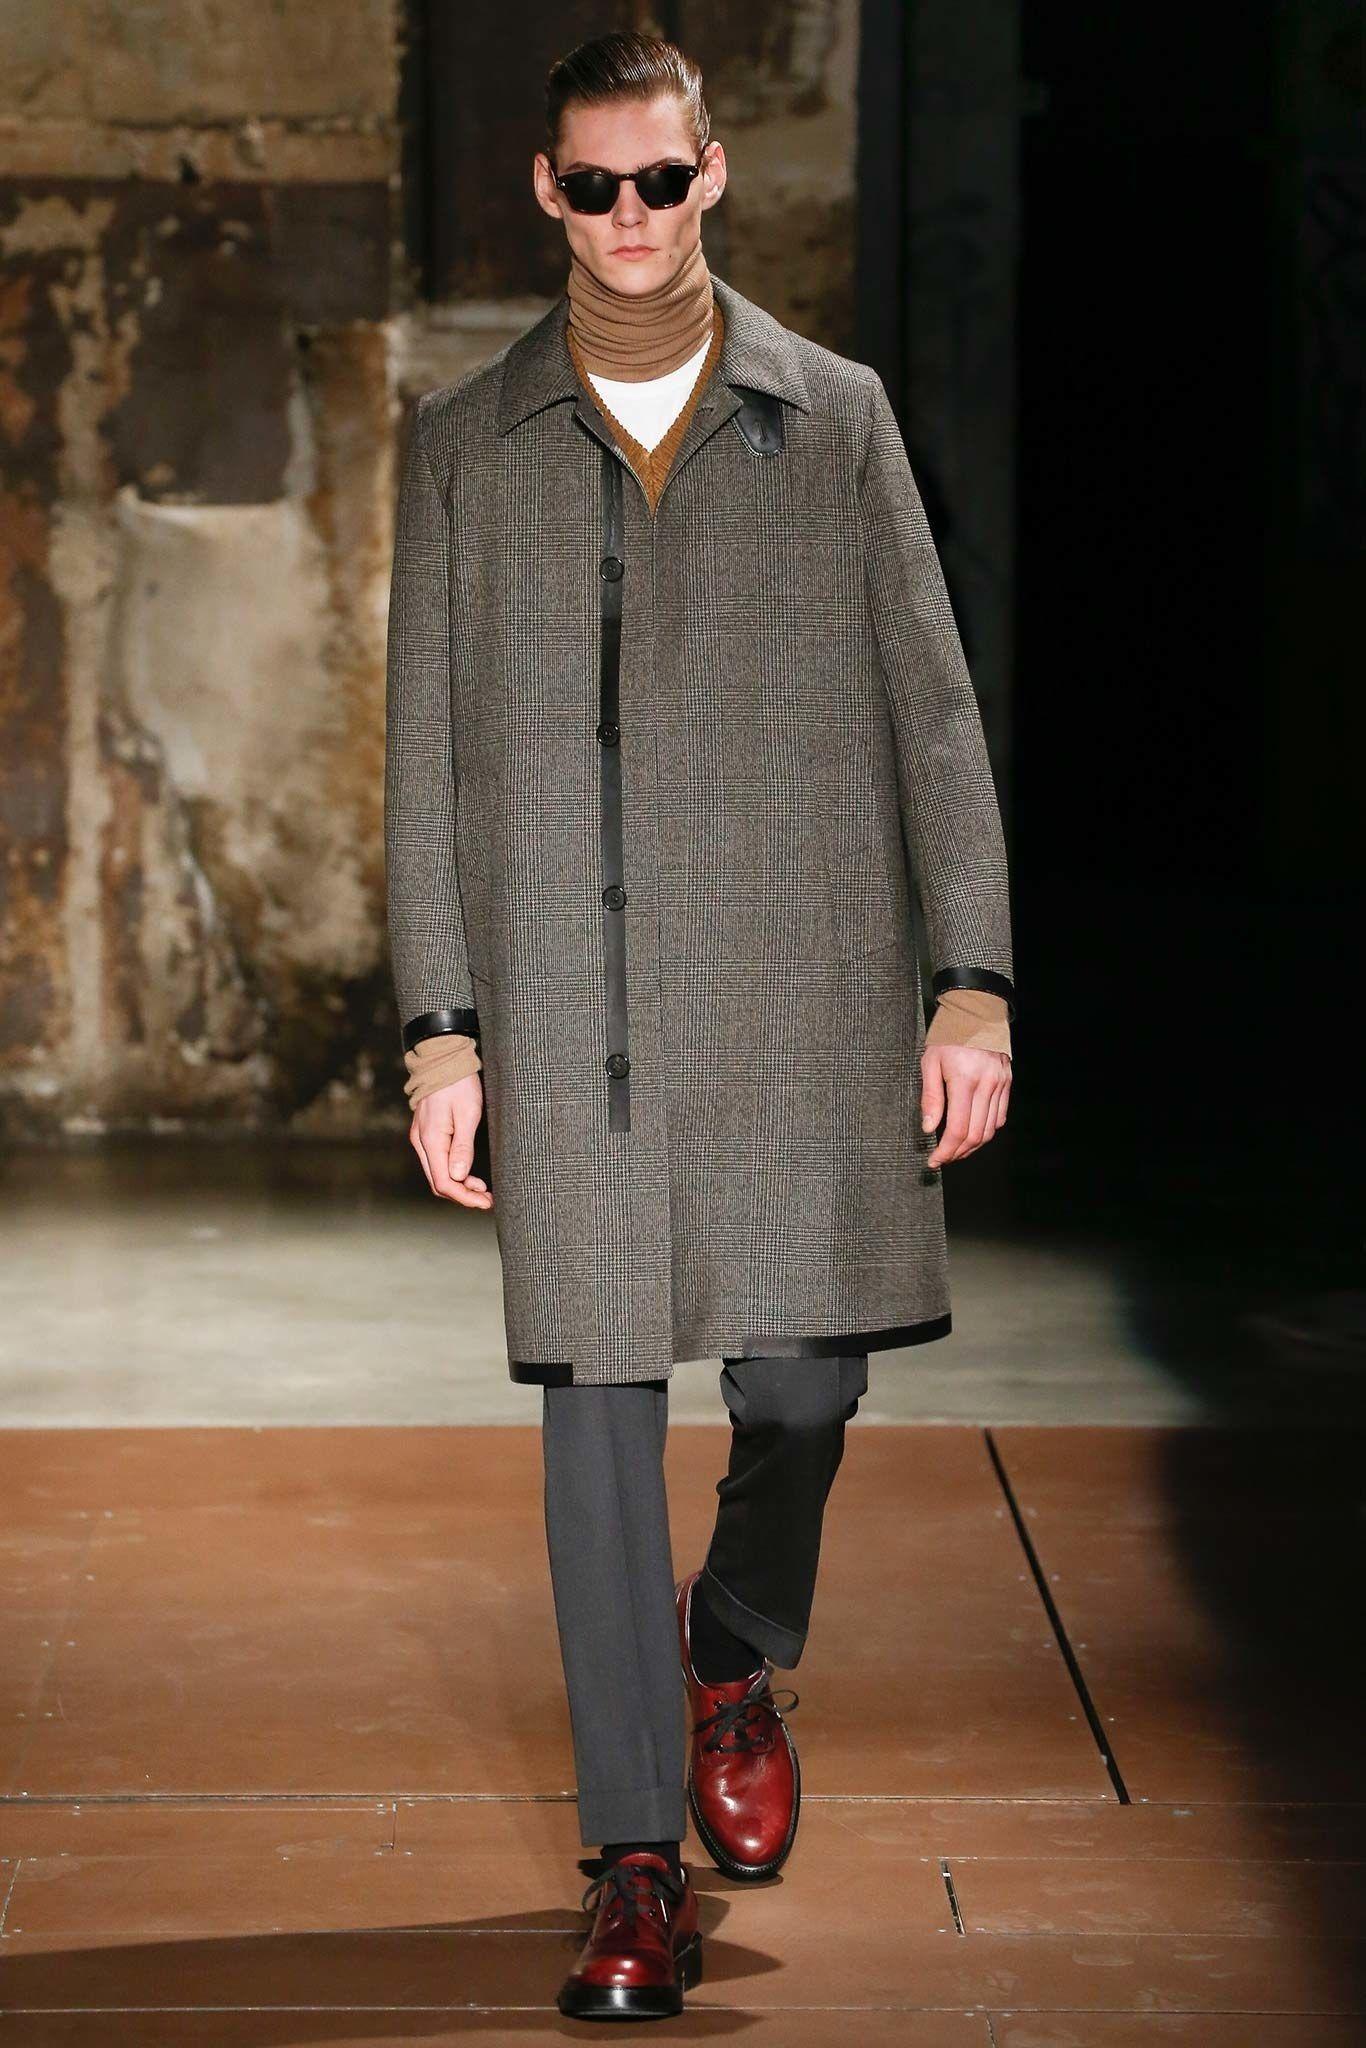 df759088ca0 Cerruti 1881 Fall 2015 Menswear Fashion Show   Ralph Lauren 2020 ...